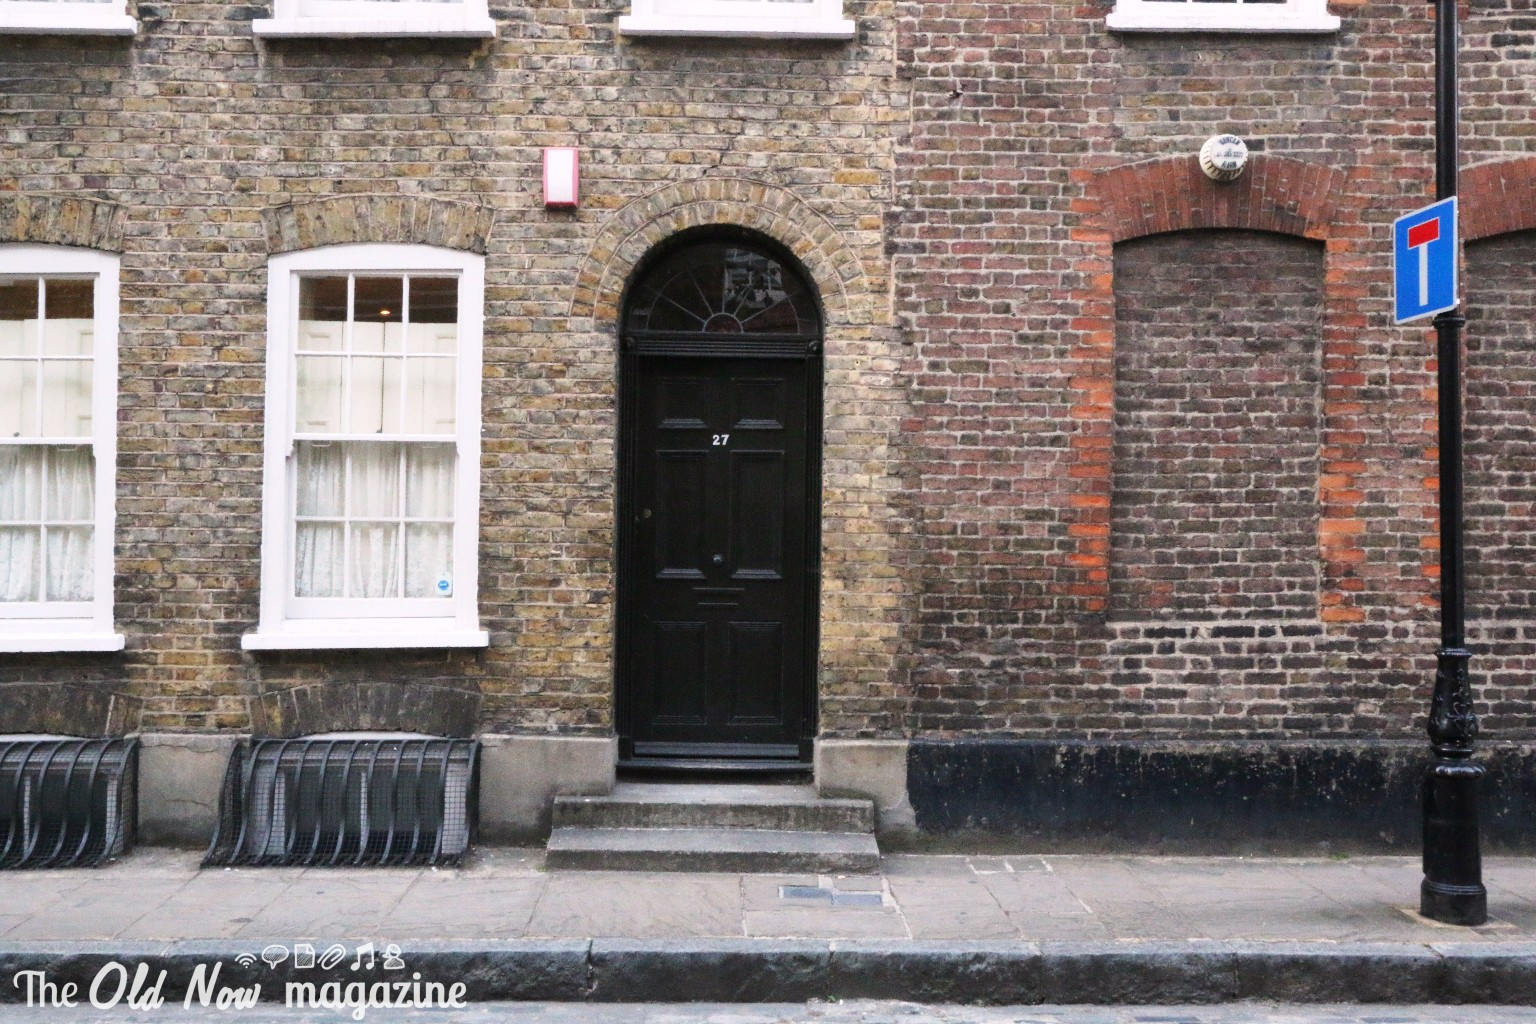 LONDRA THEOLDNOW (73)